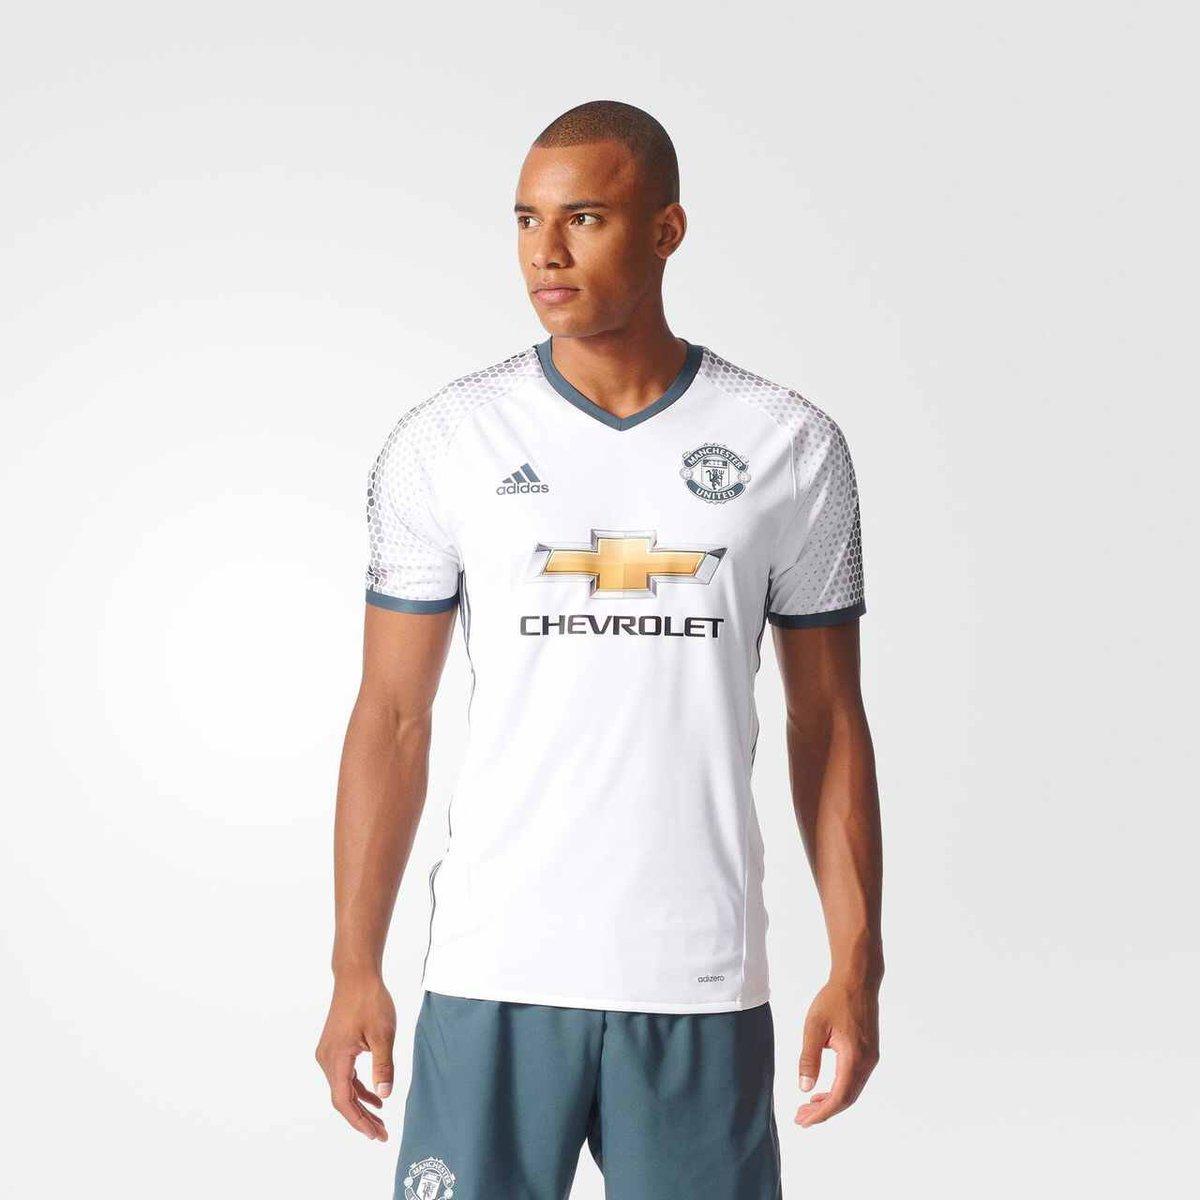 Football Kits 16 17 On Twitter Man Utd Third Kit Manutd Manchesterunited Mufc Thereddevils Reddevils